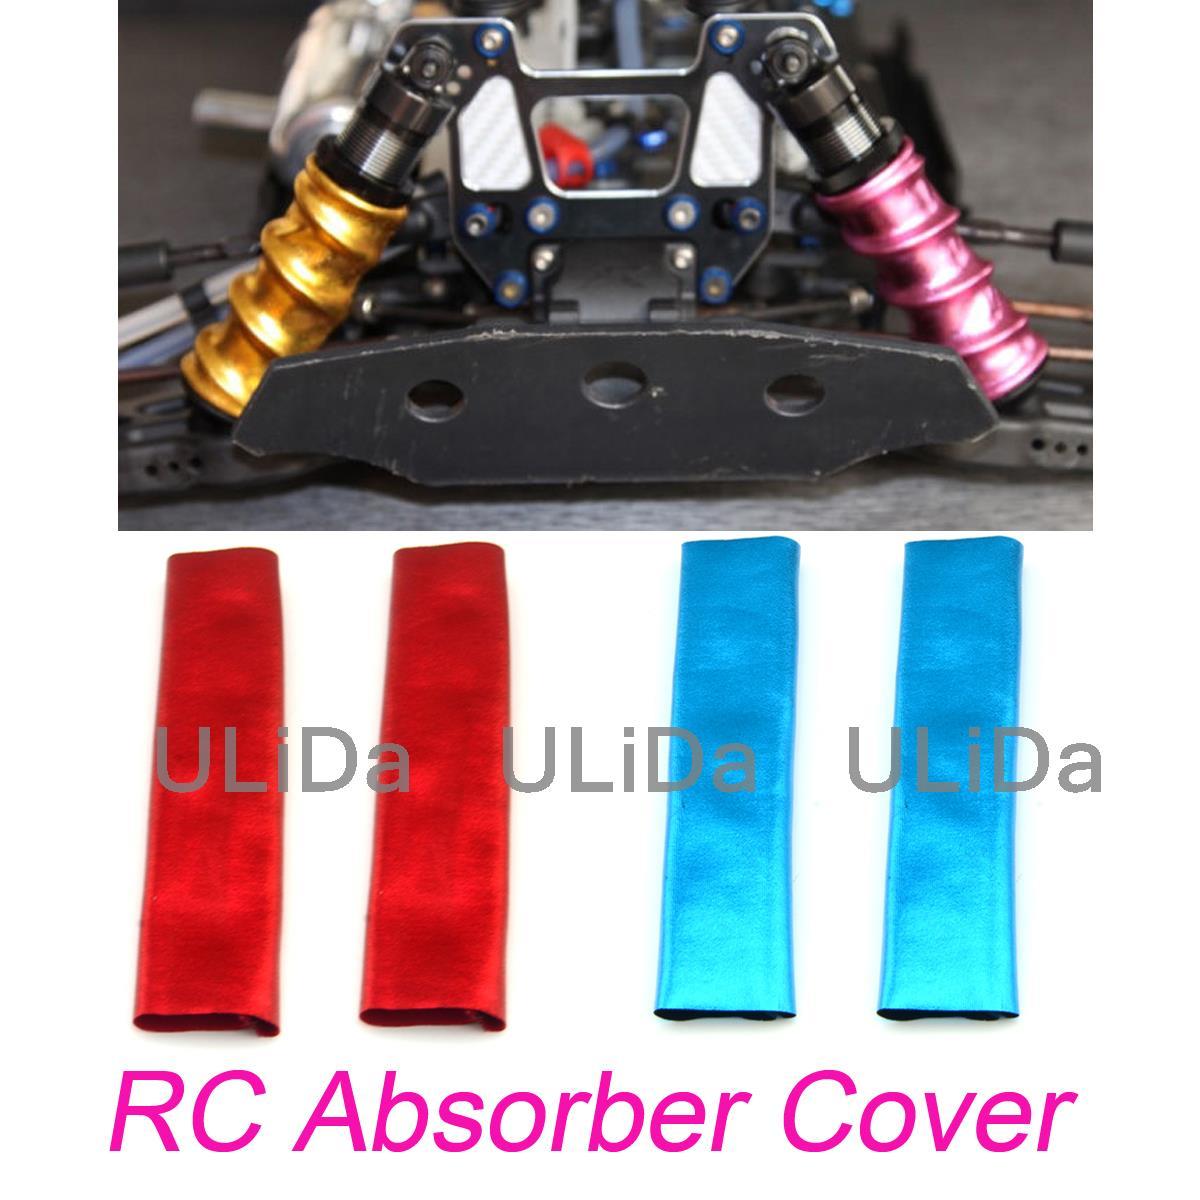 4Pcs/Set Shock Absorber Cover Dust-proof 1/8 Off Road Car Truck Buggy Monster RC Car Parts For HSP Hpi